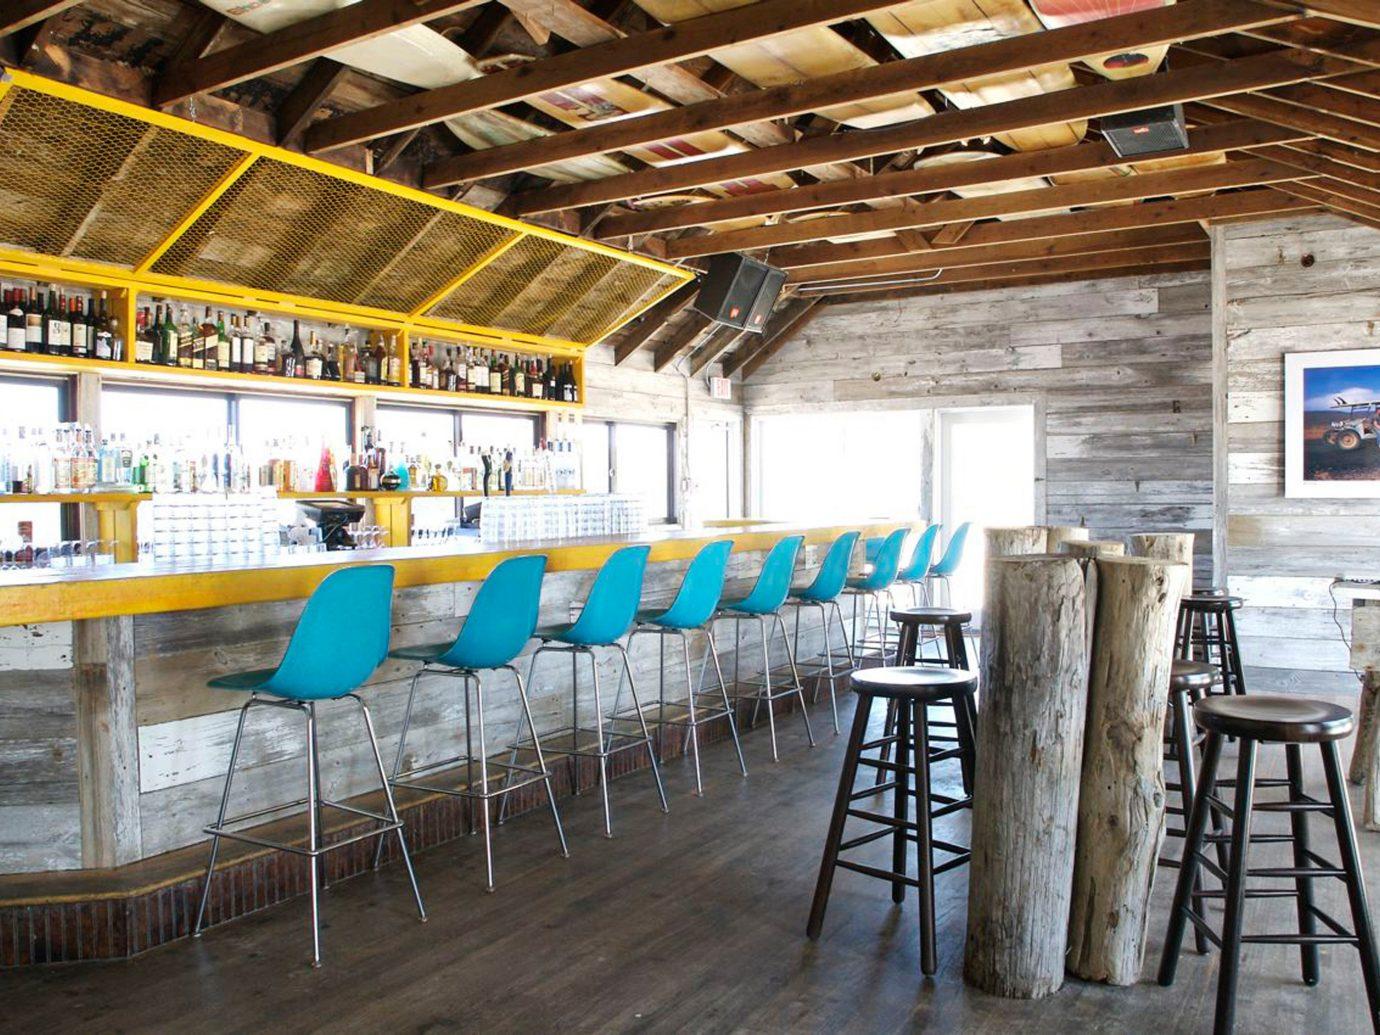 Hotels Solo Travel Trip Ideas floor indoor ceiling restaurant stall wood